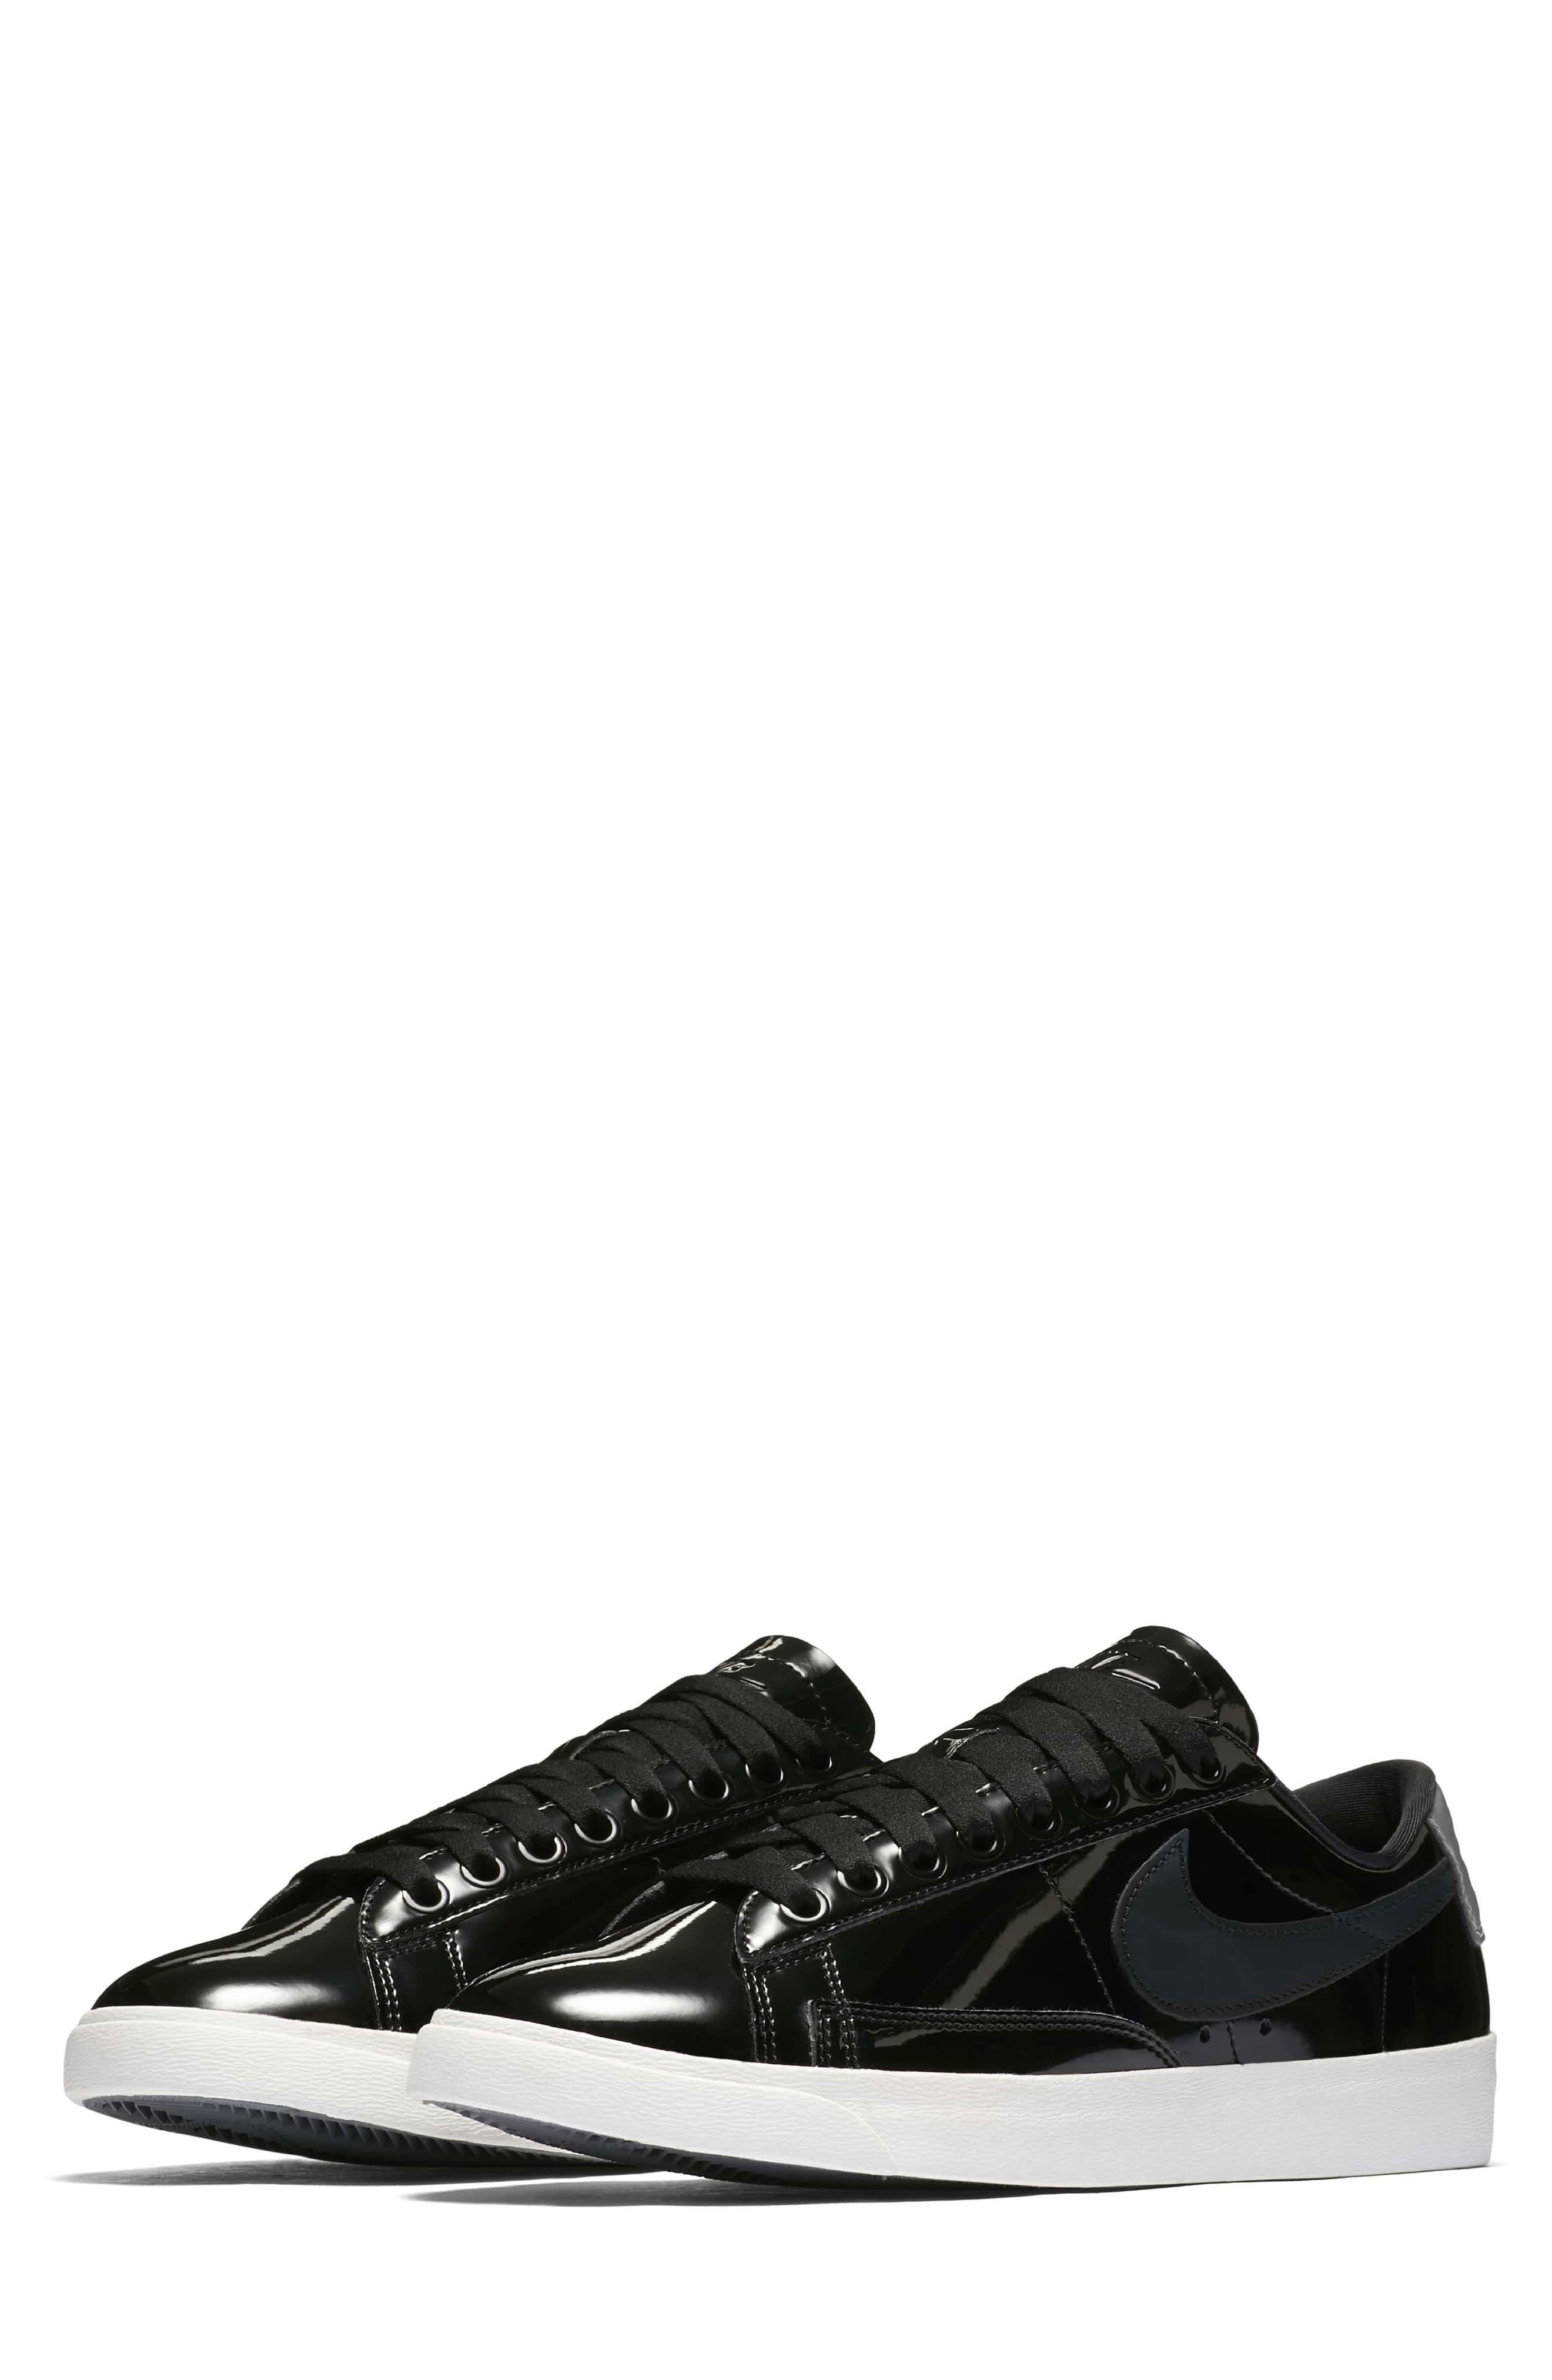 NIKE Blazer Low Top Sneaker SE, Main, color, 001